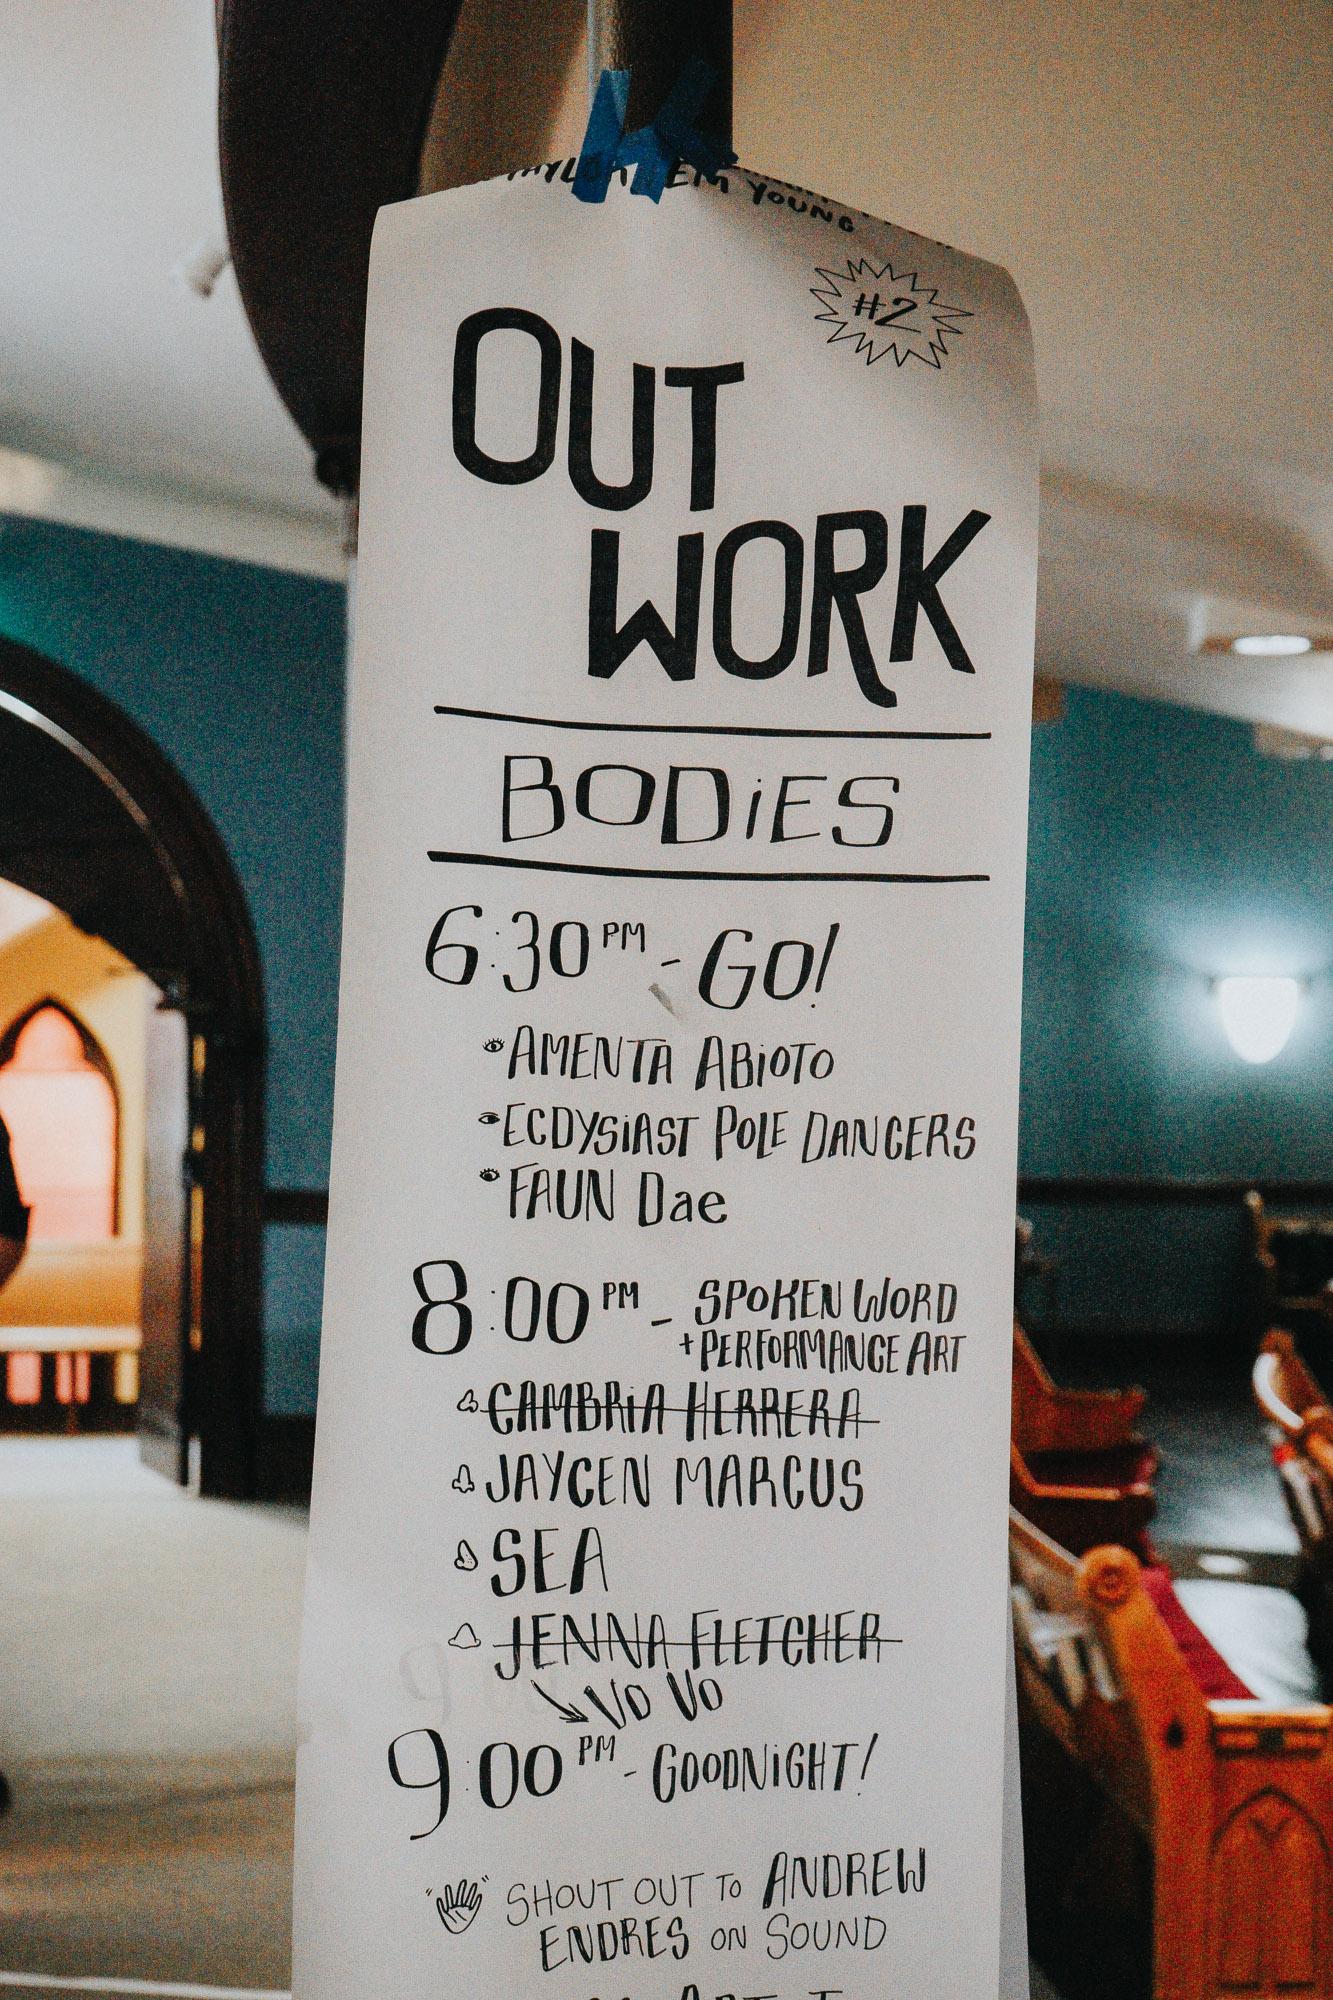 Outwork Bodies - Rowan Bradley-0754.jpg